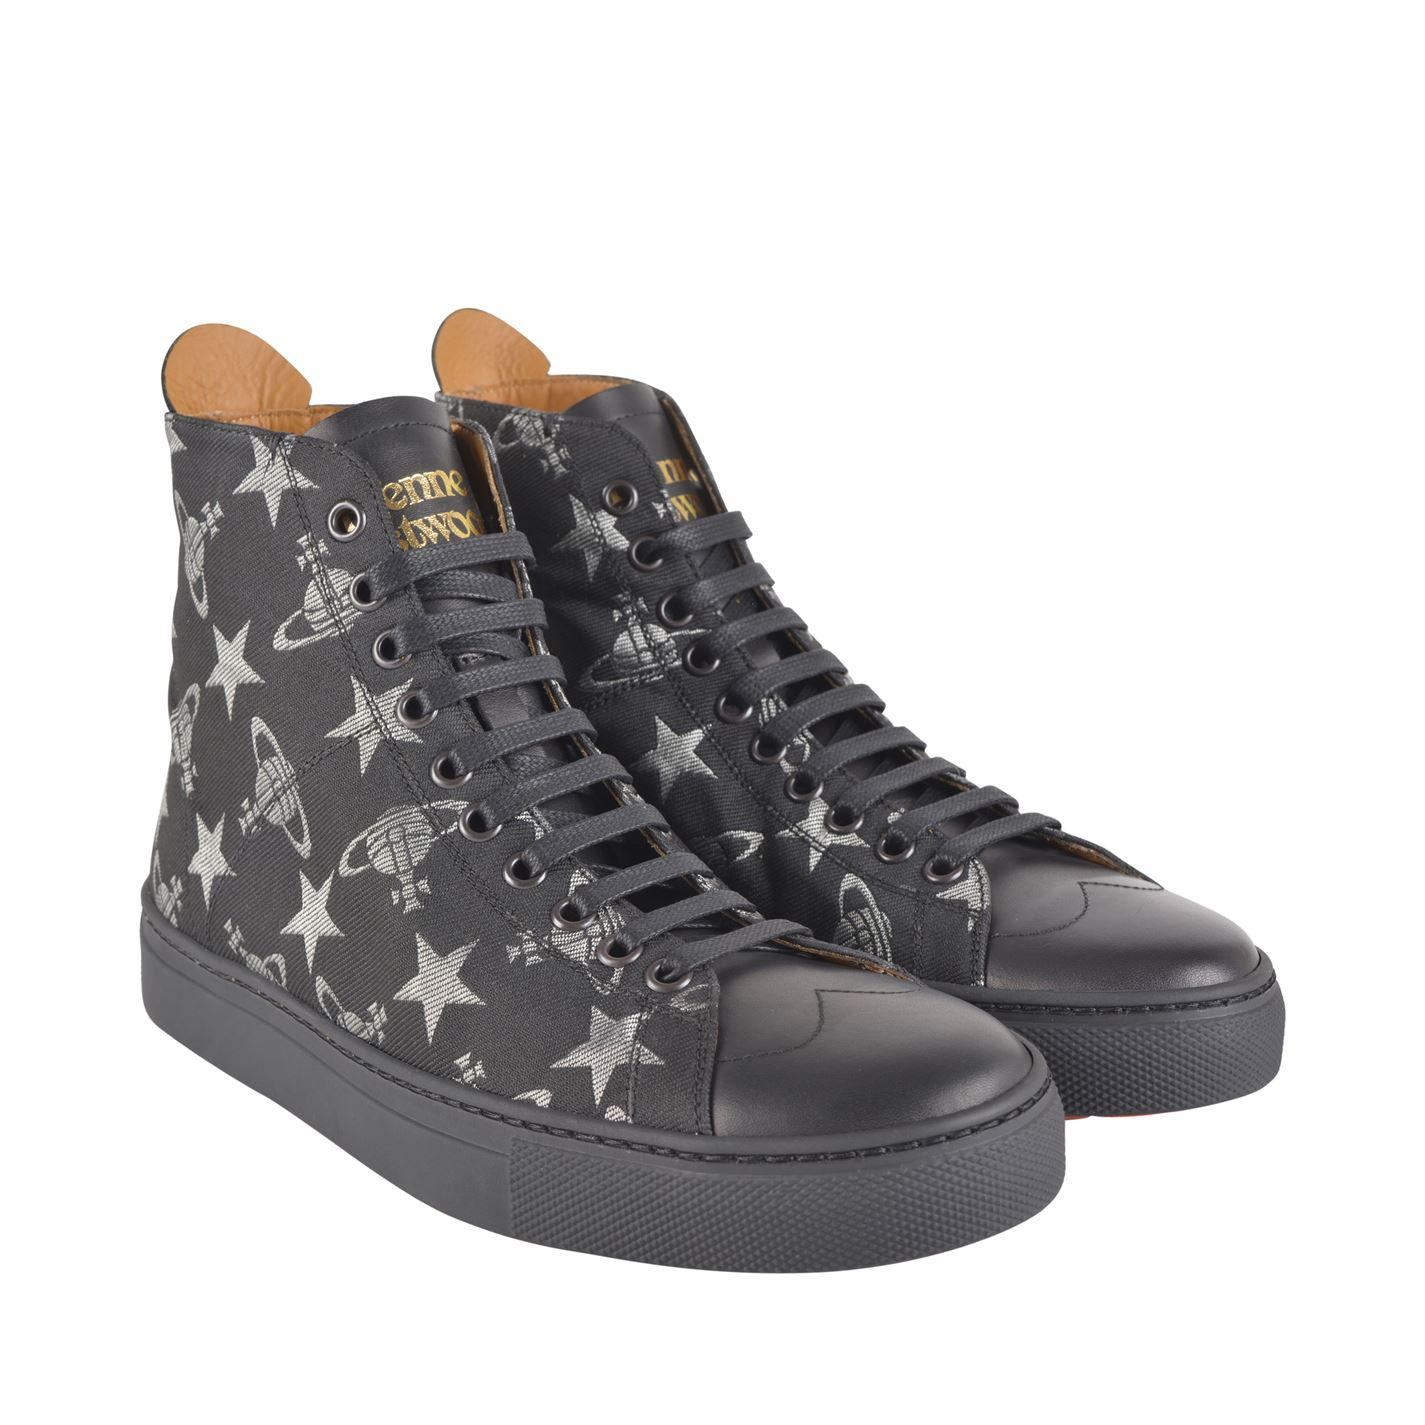 Vivienne Westwood Leather Jacquard High